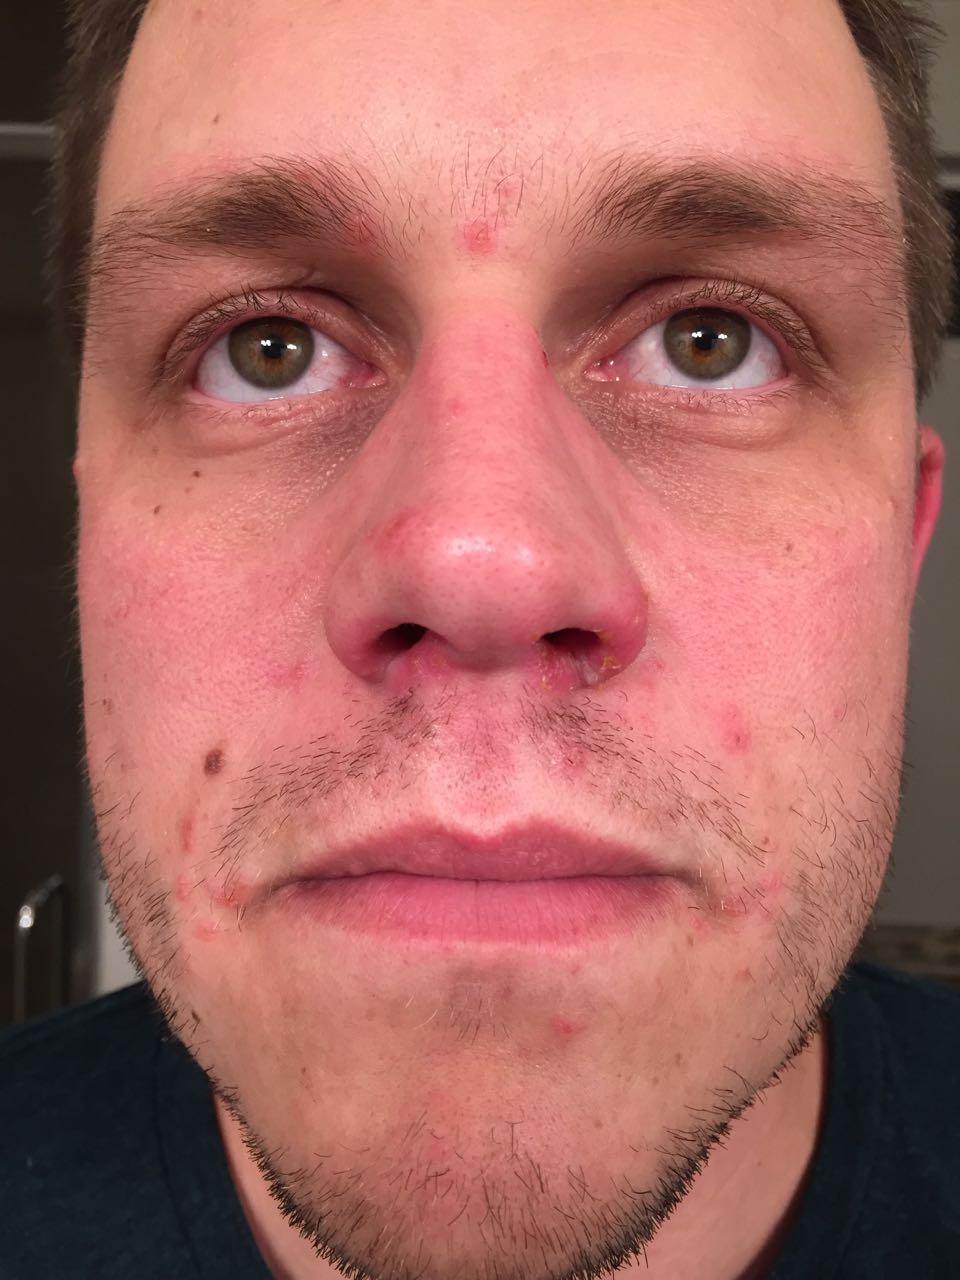 Face Monday